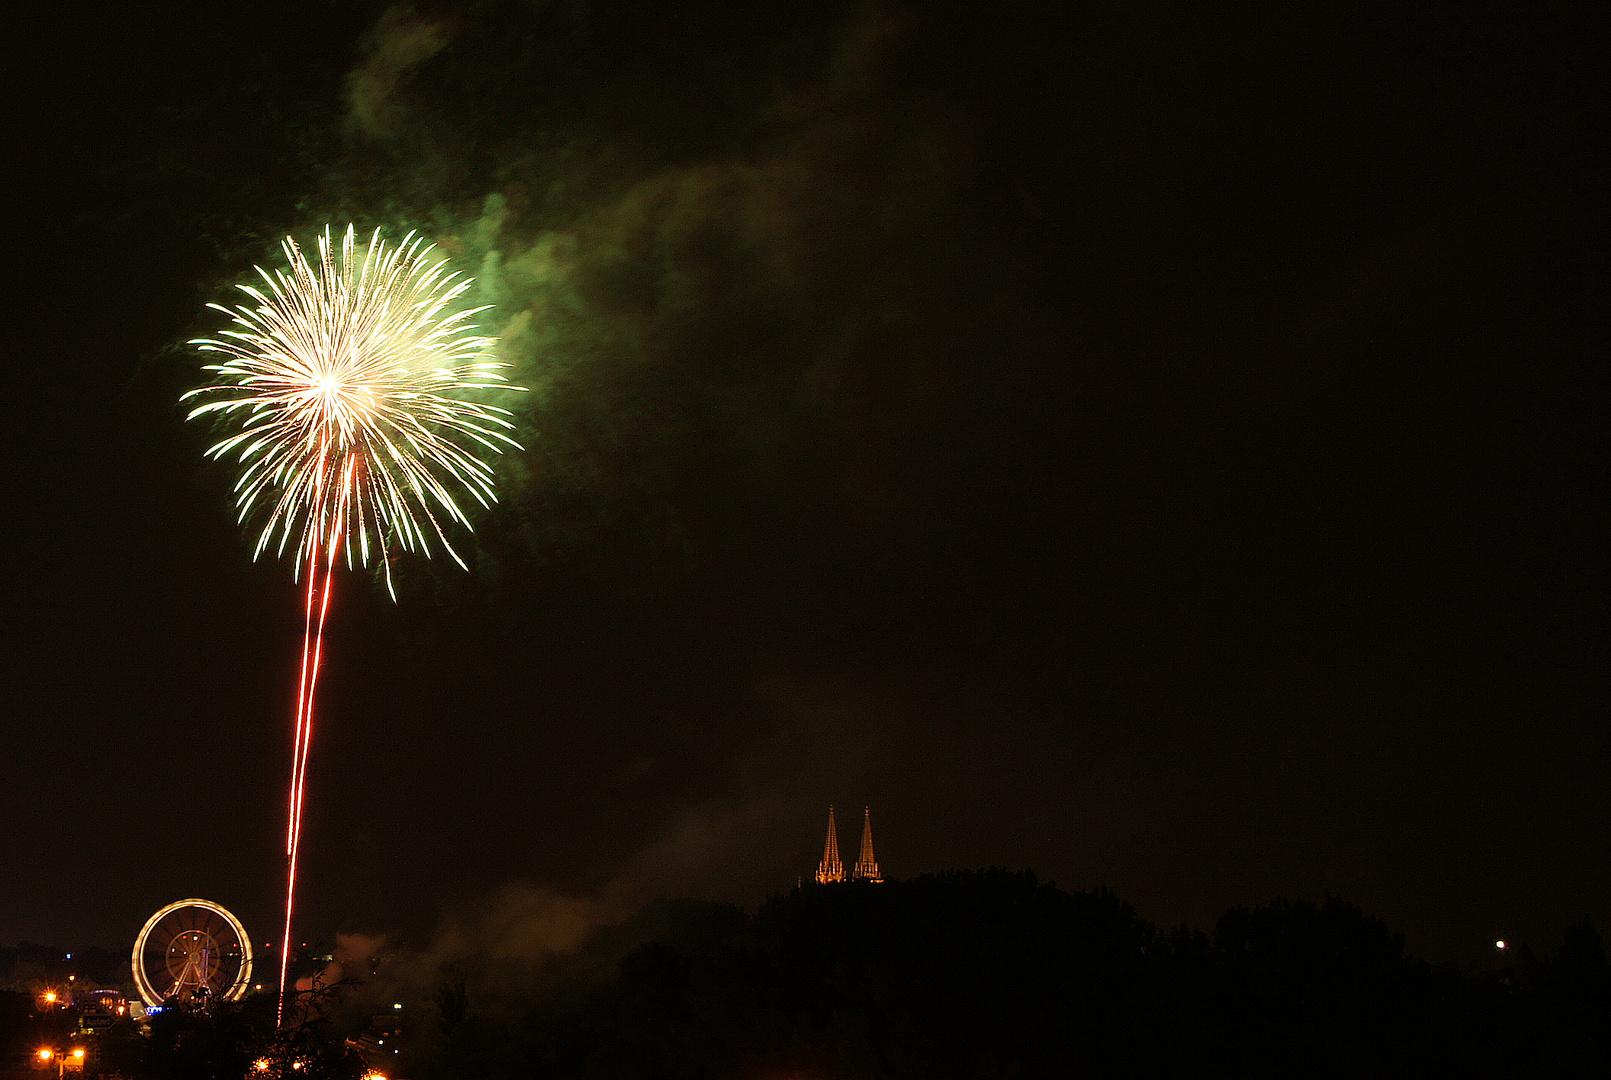 Eröffnungsfeuerwerk Herbstdult Regensburg